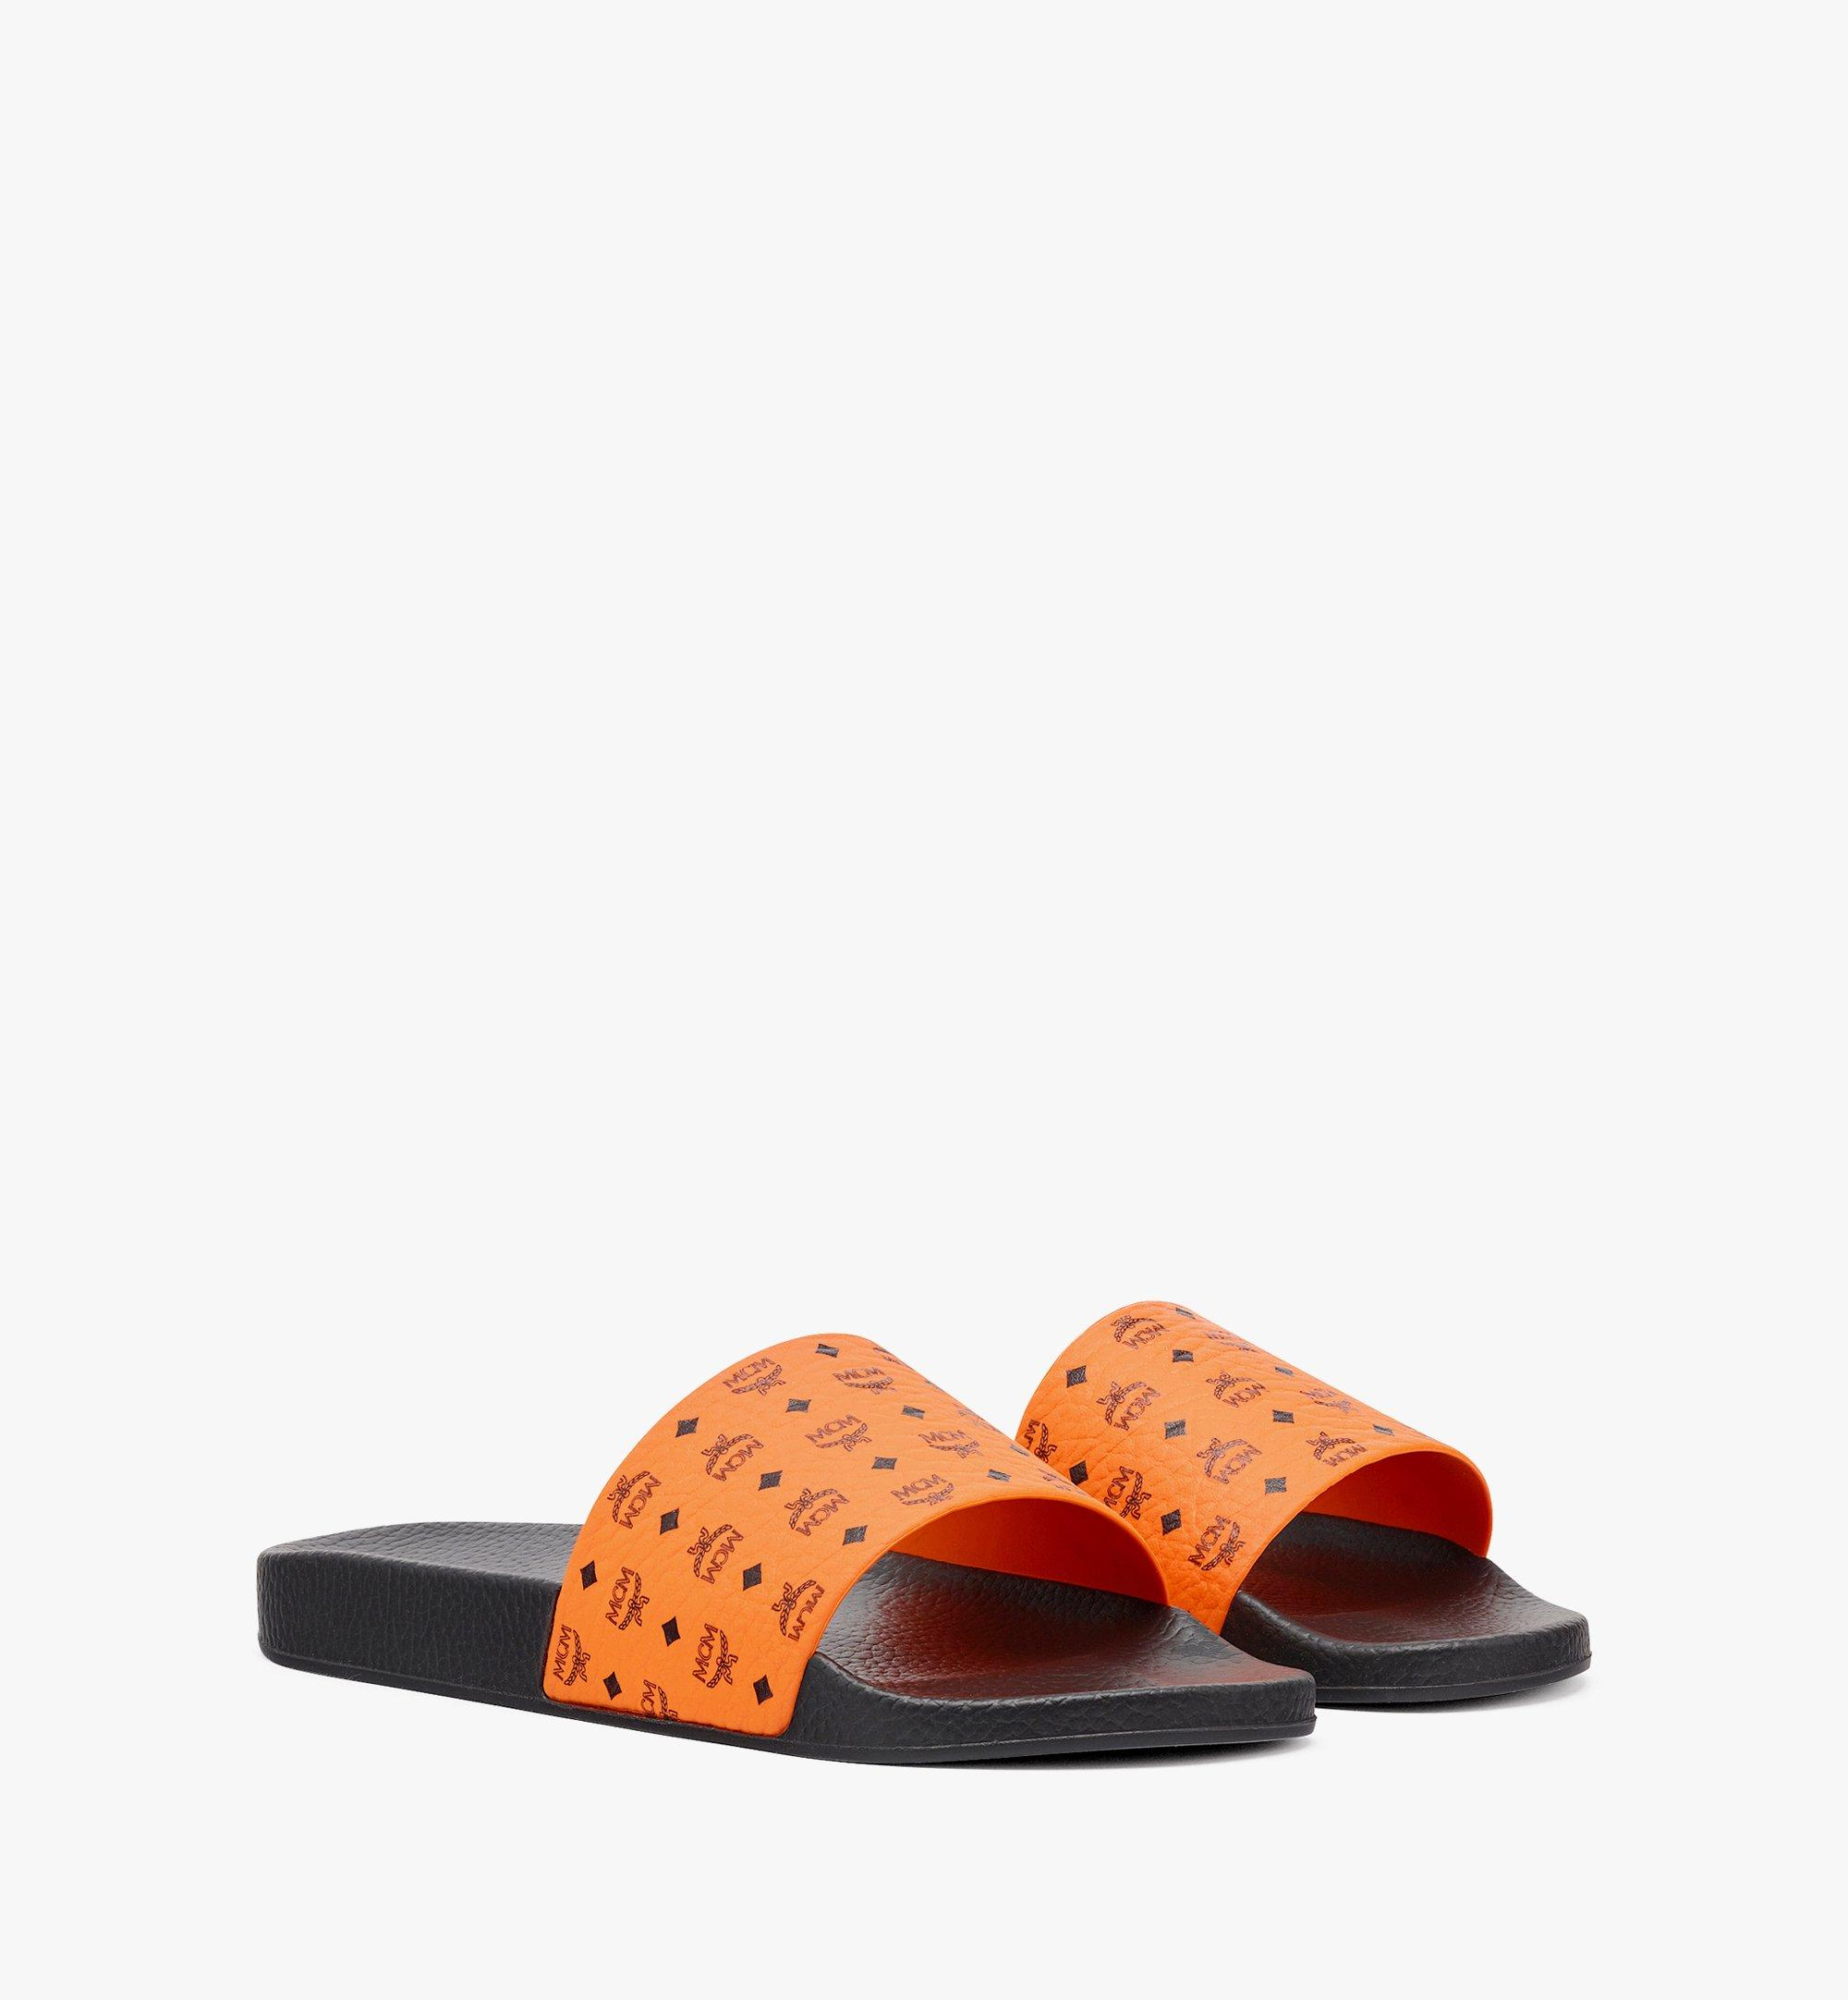 MCM Men's Visetos Rubber Slides Orange MEX8AMM60O9045 Alternate View 1